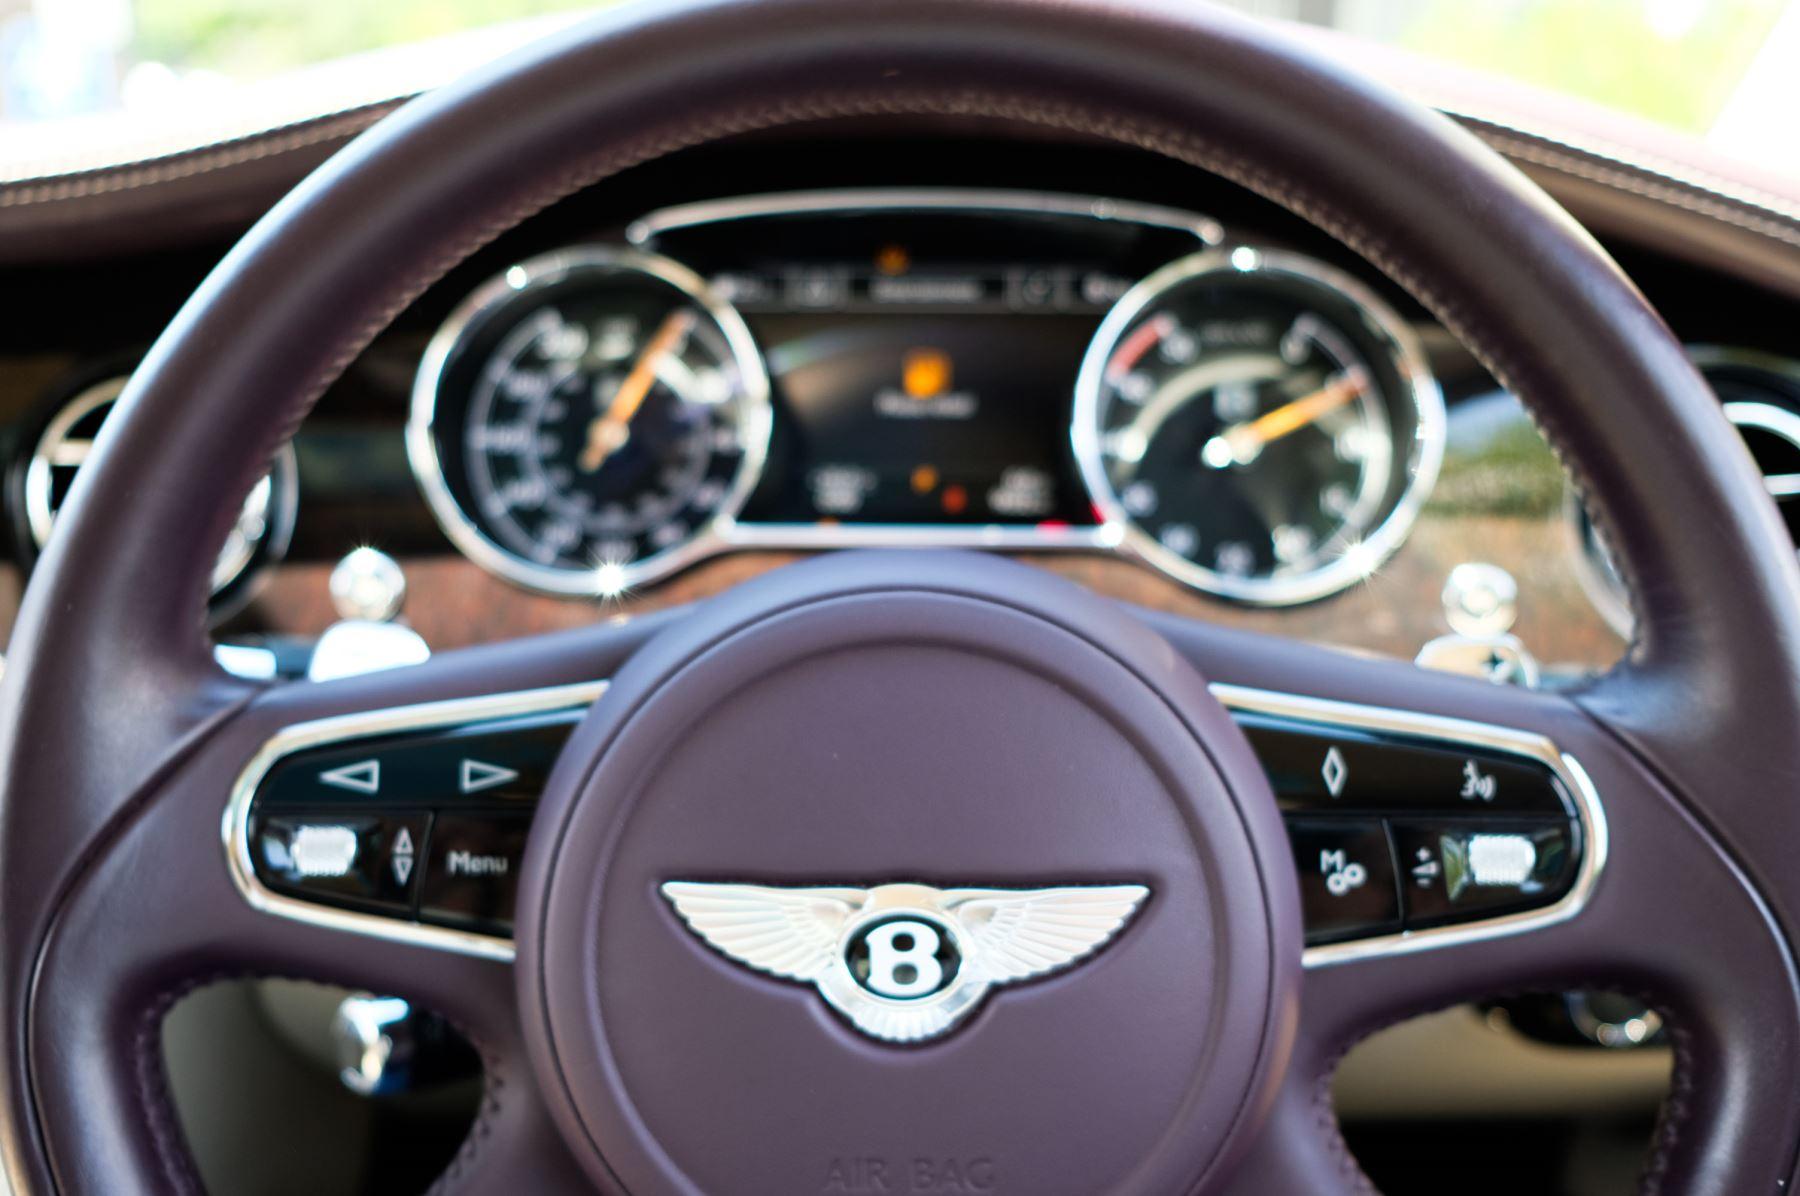 Bentley Mulsanne 6.8 V8 - Comfort, Entertainment and Premier Specification image 15